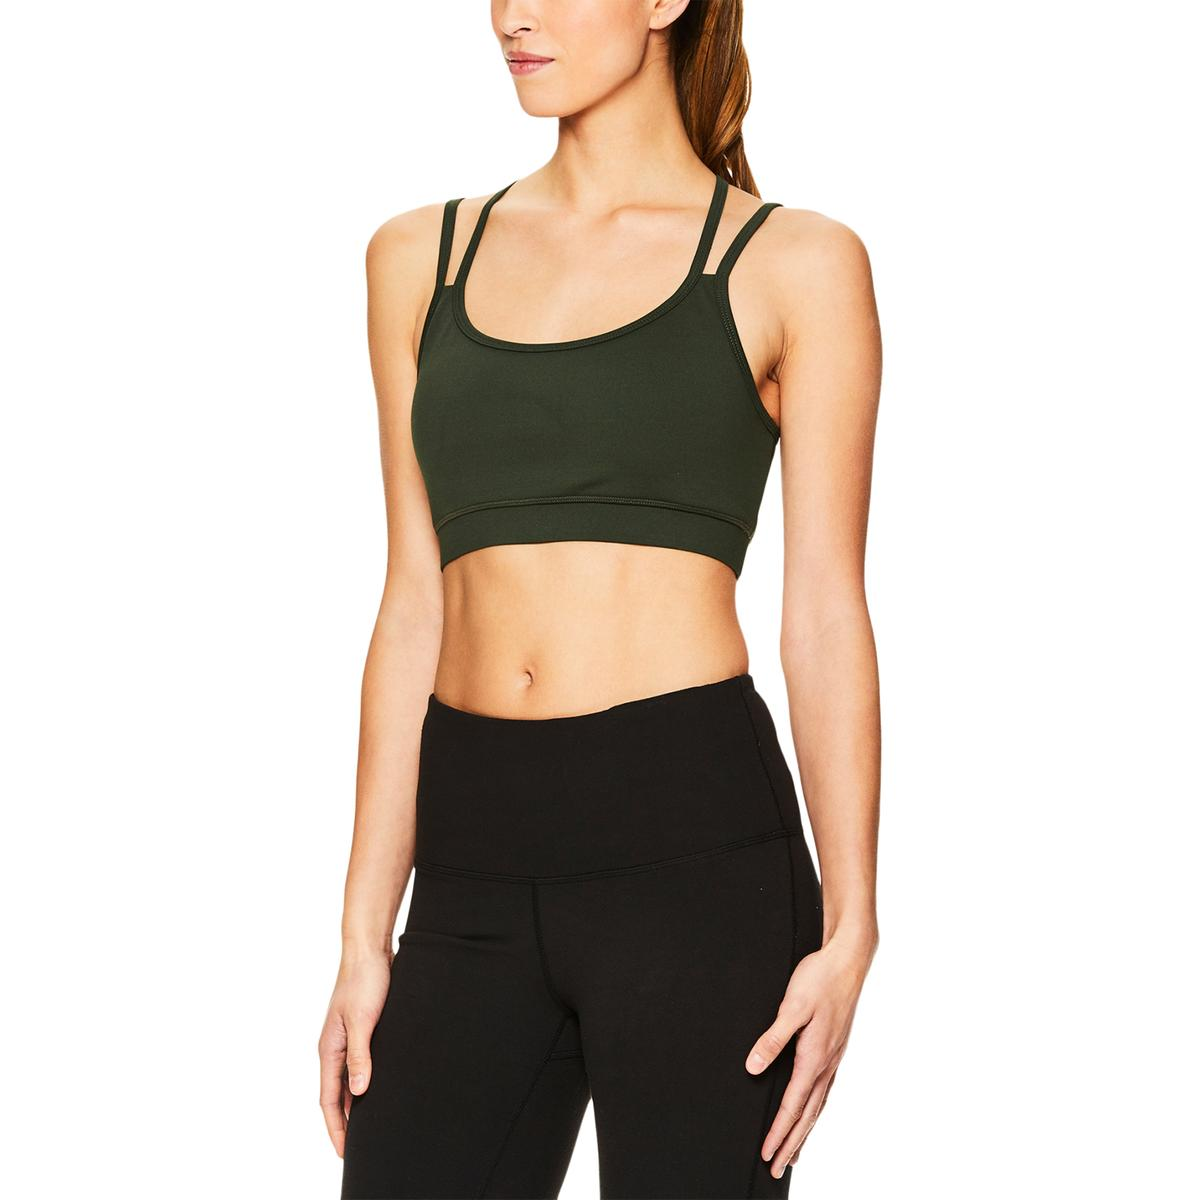 ca86155824 Details about Gaiam Womens Stella Fitness Yoga Running Sports Bra Athletic  BHFO 4034